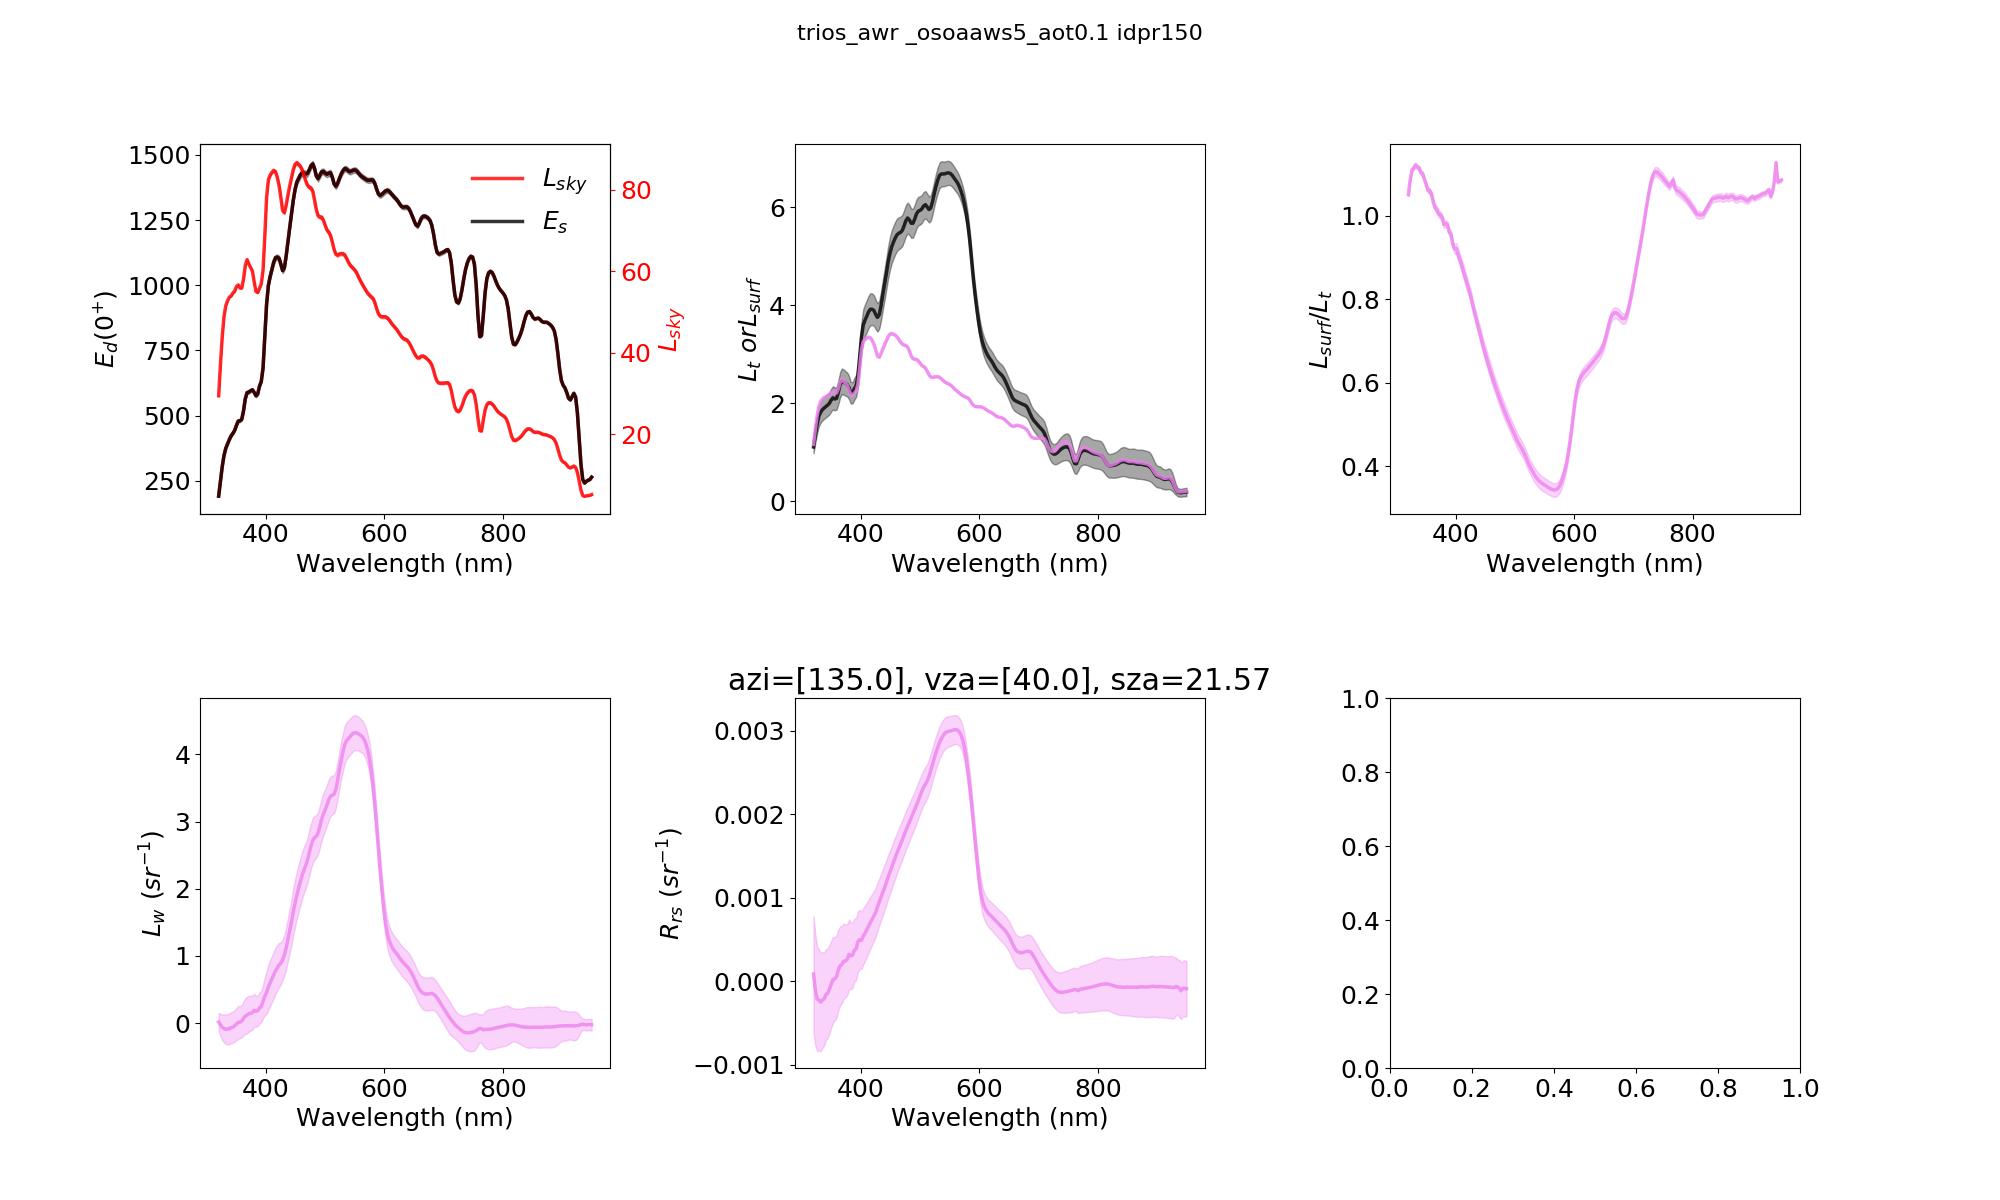 test/fig/trios_awr_2018-05-30_idpr150_osoaaws5_aot0.1.png